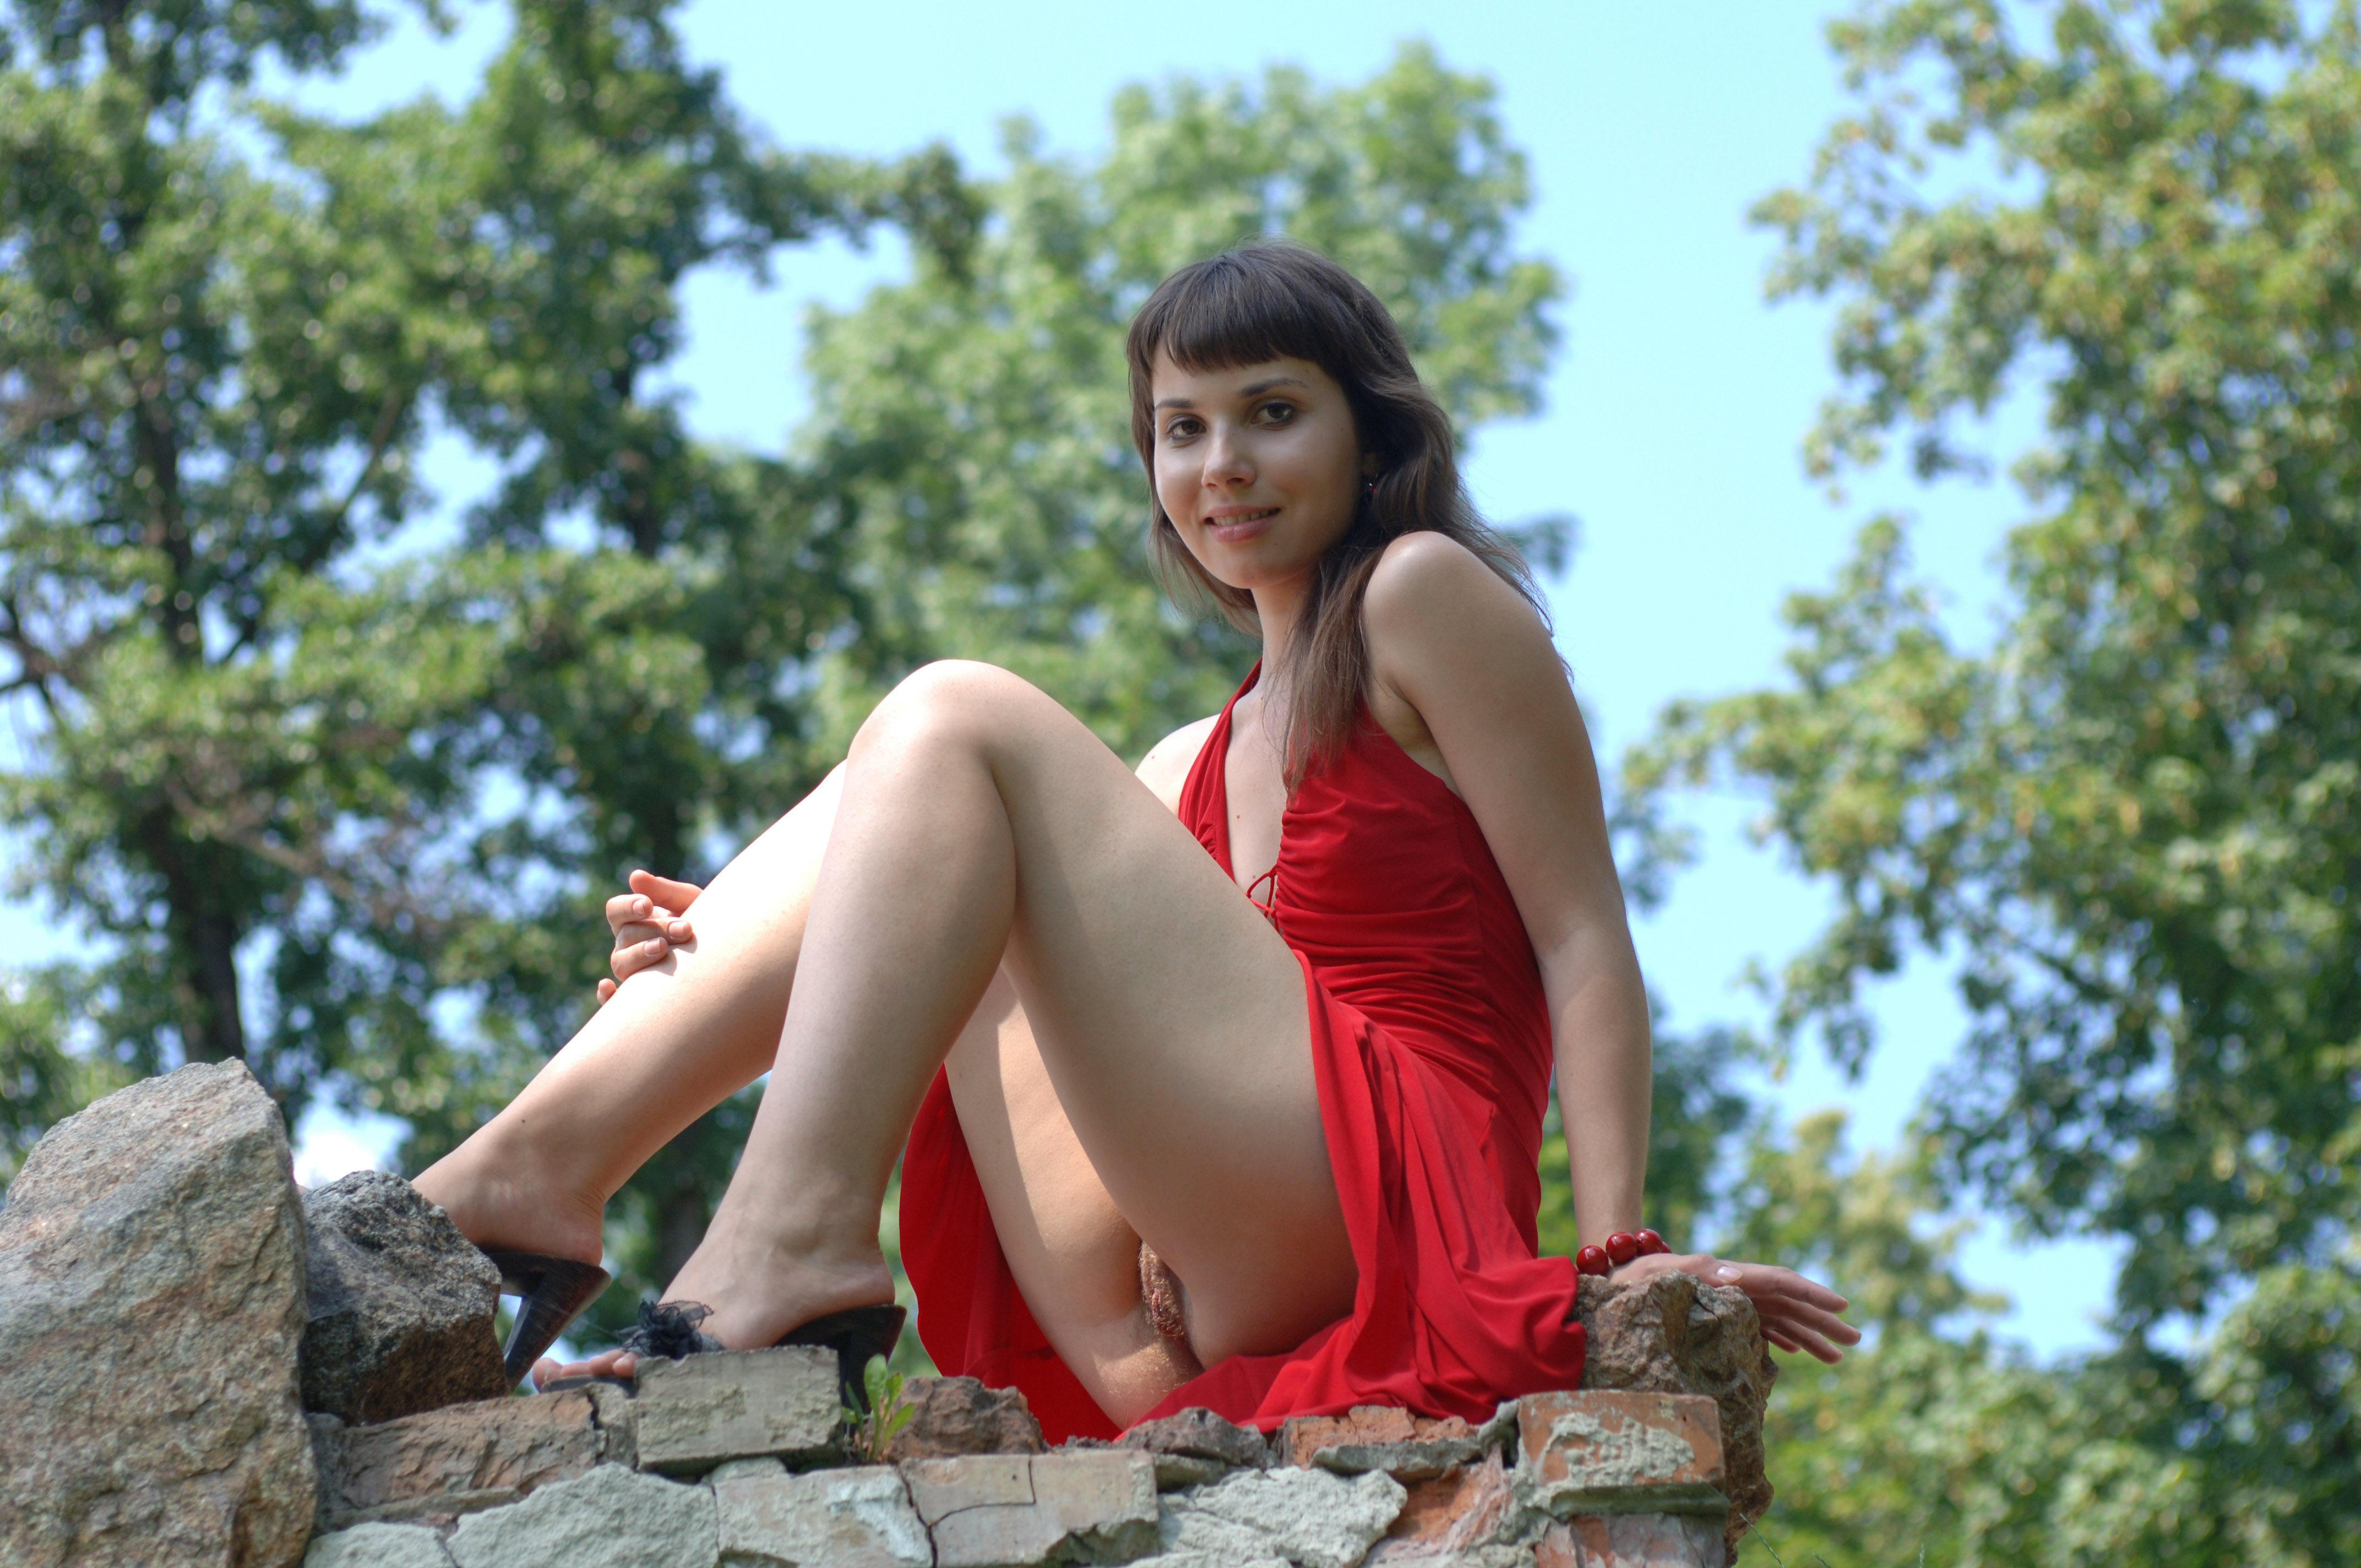 Фото девушка без трусов под платьем